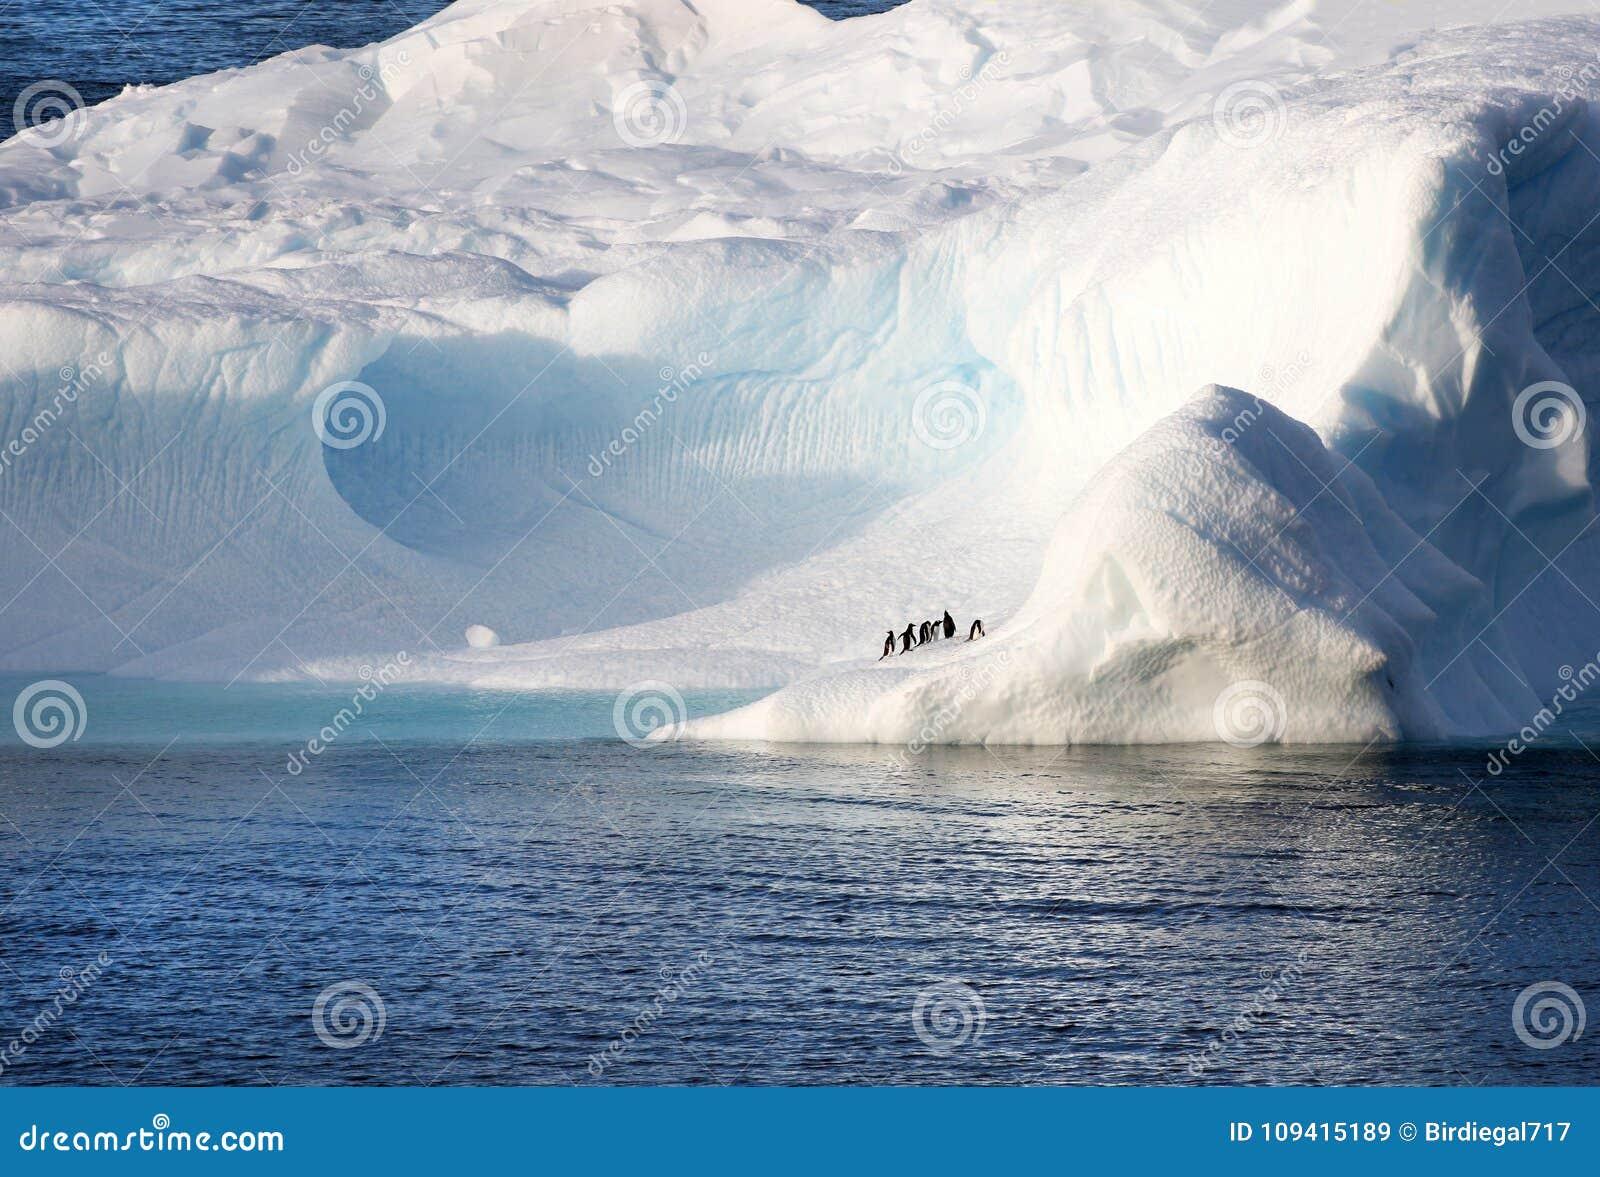 Penguins standing on a huge iceberg. Cavernous blue ice cave. Antarctica Landscape